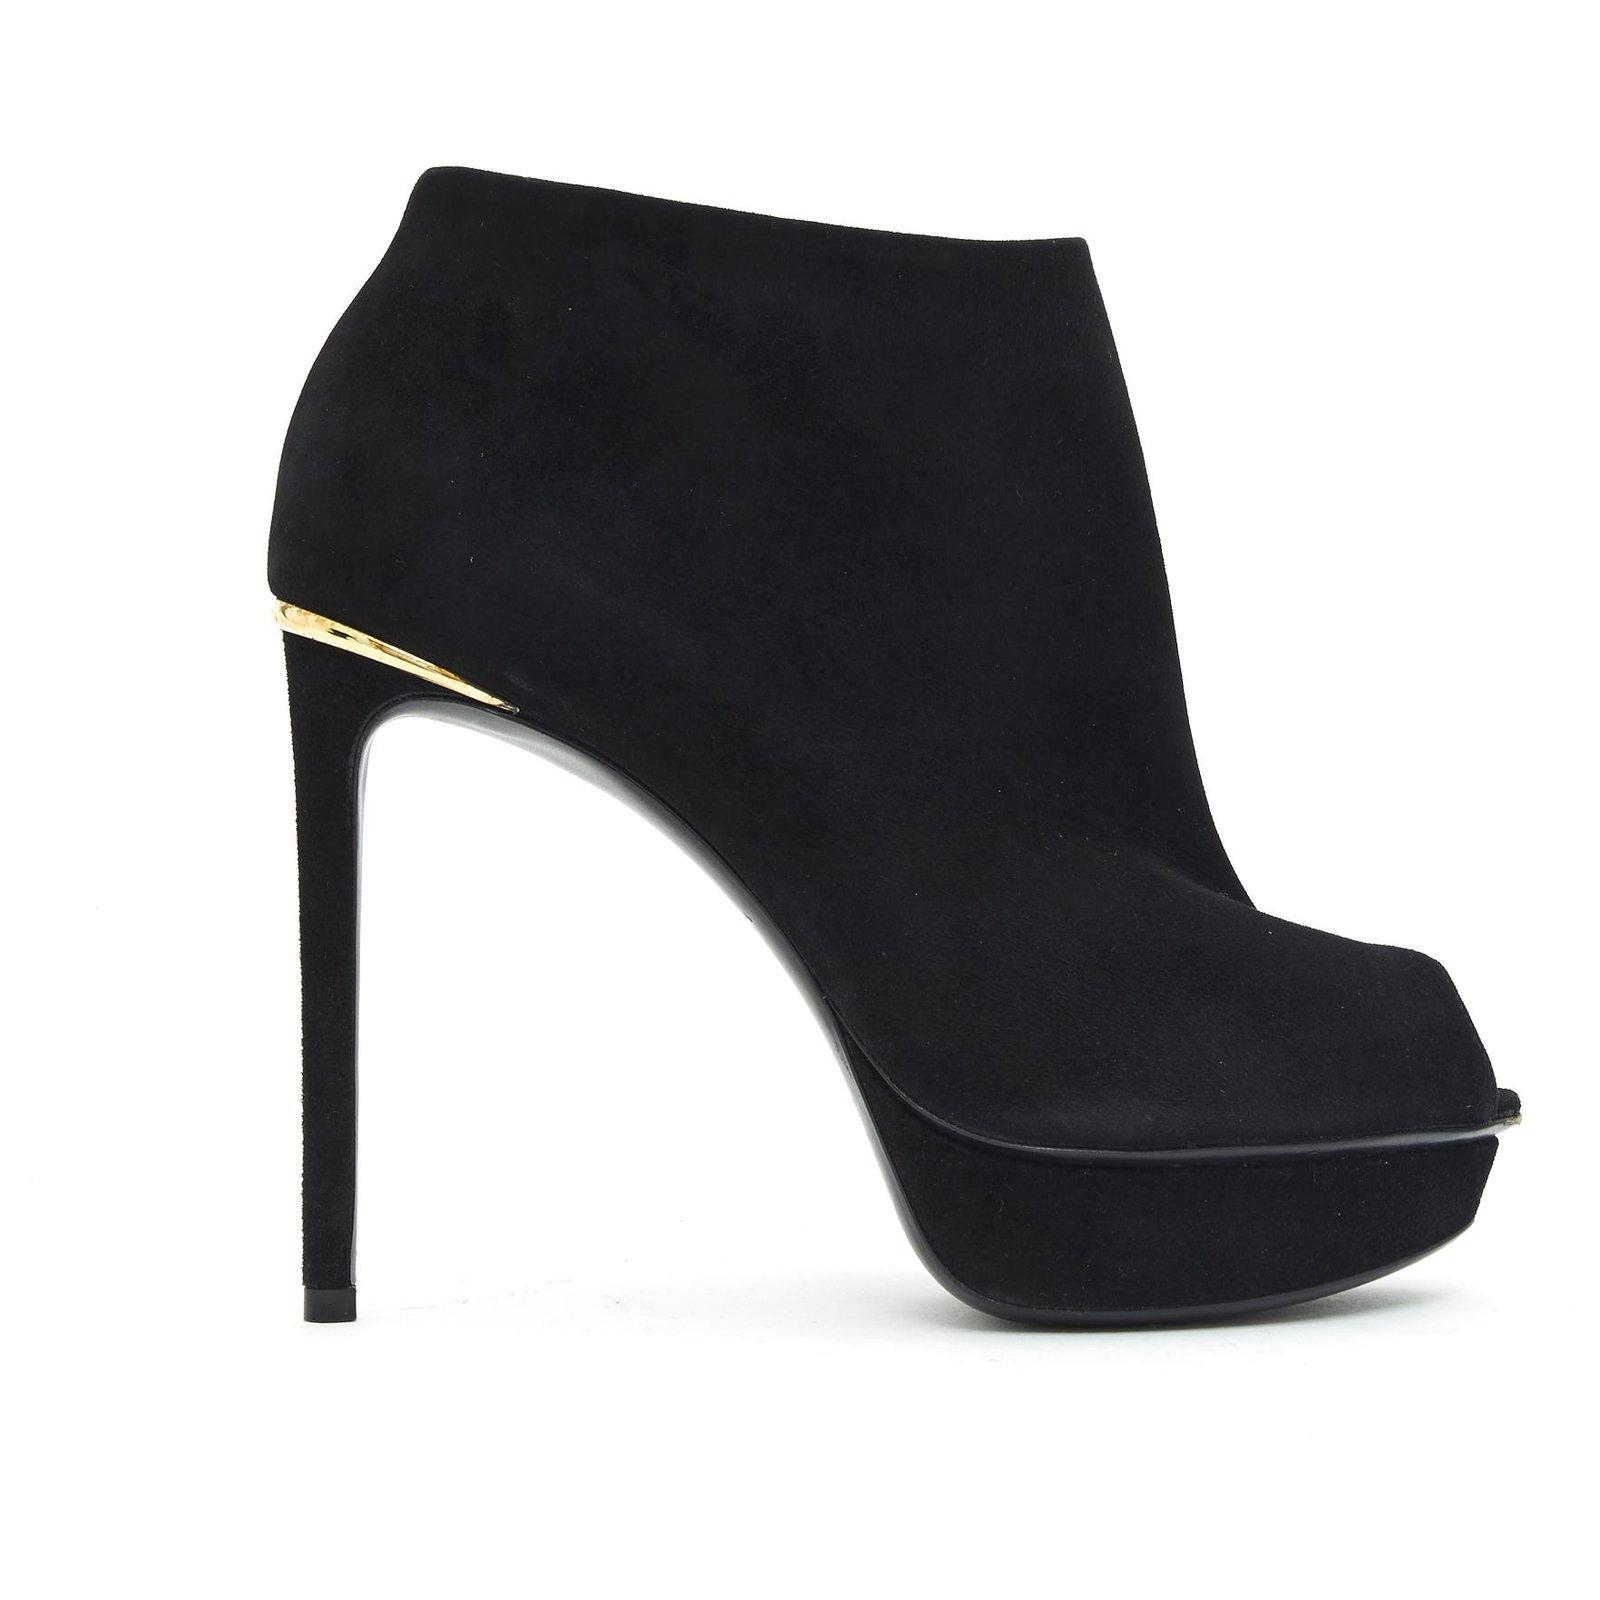 louis vuitton heels open toe